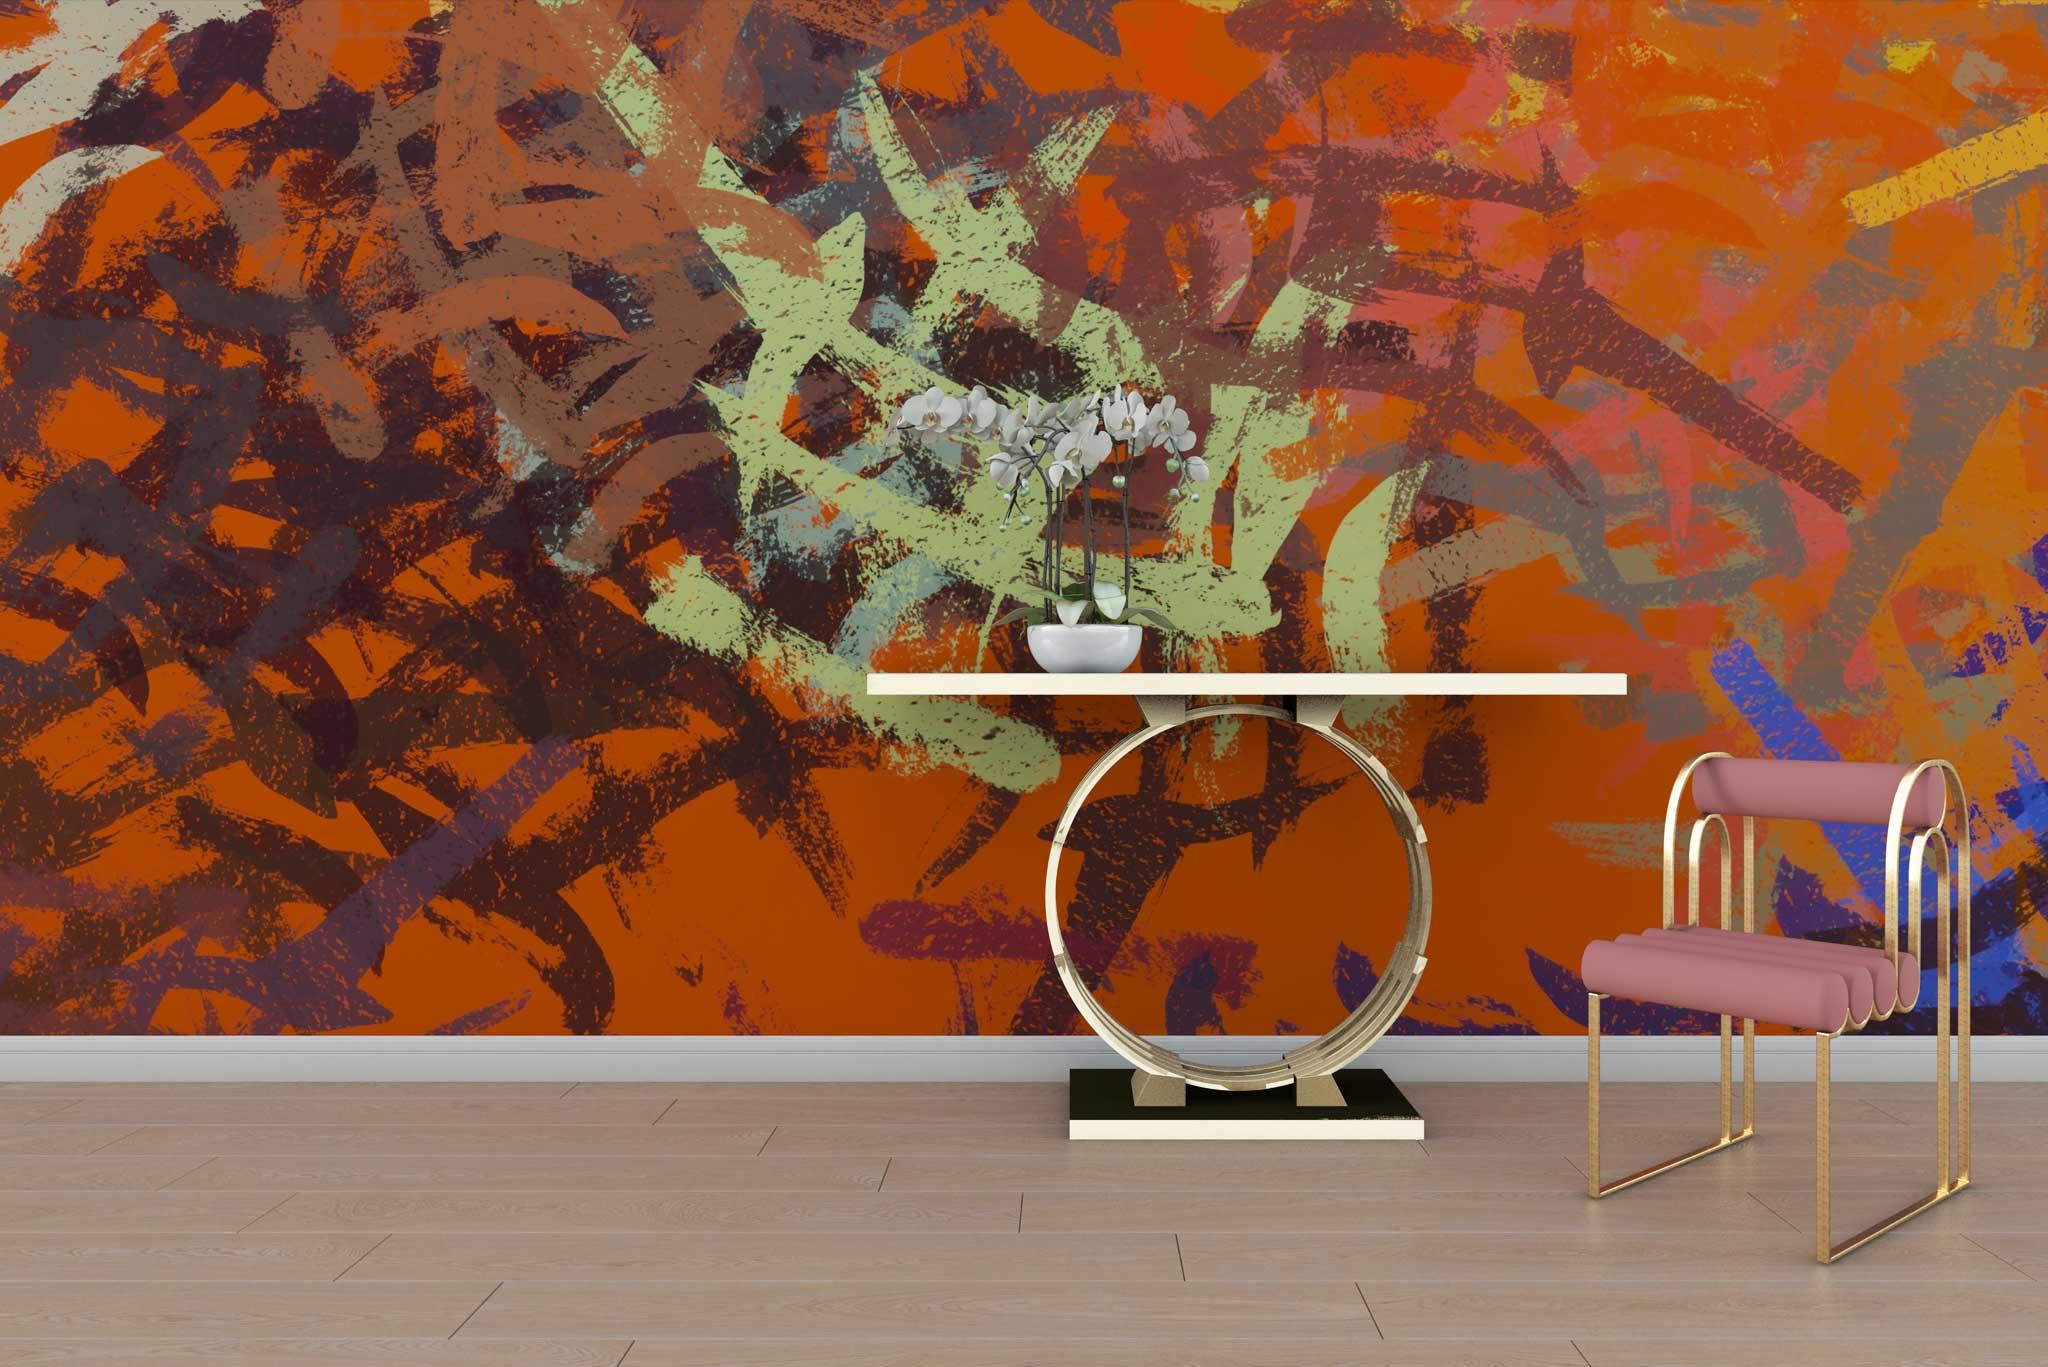 tapet-fototapet-special-personalizat-customizabil-comanda-bucuresti-daring-prints-model-pictura-contemporana-abstracta-tuse-pensula-rosu